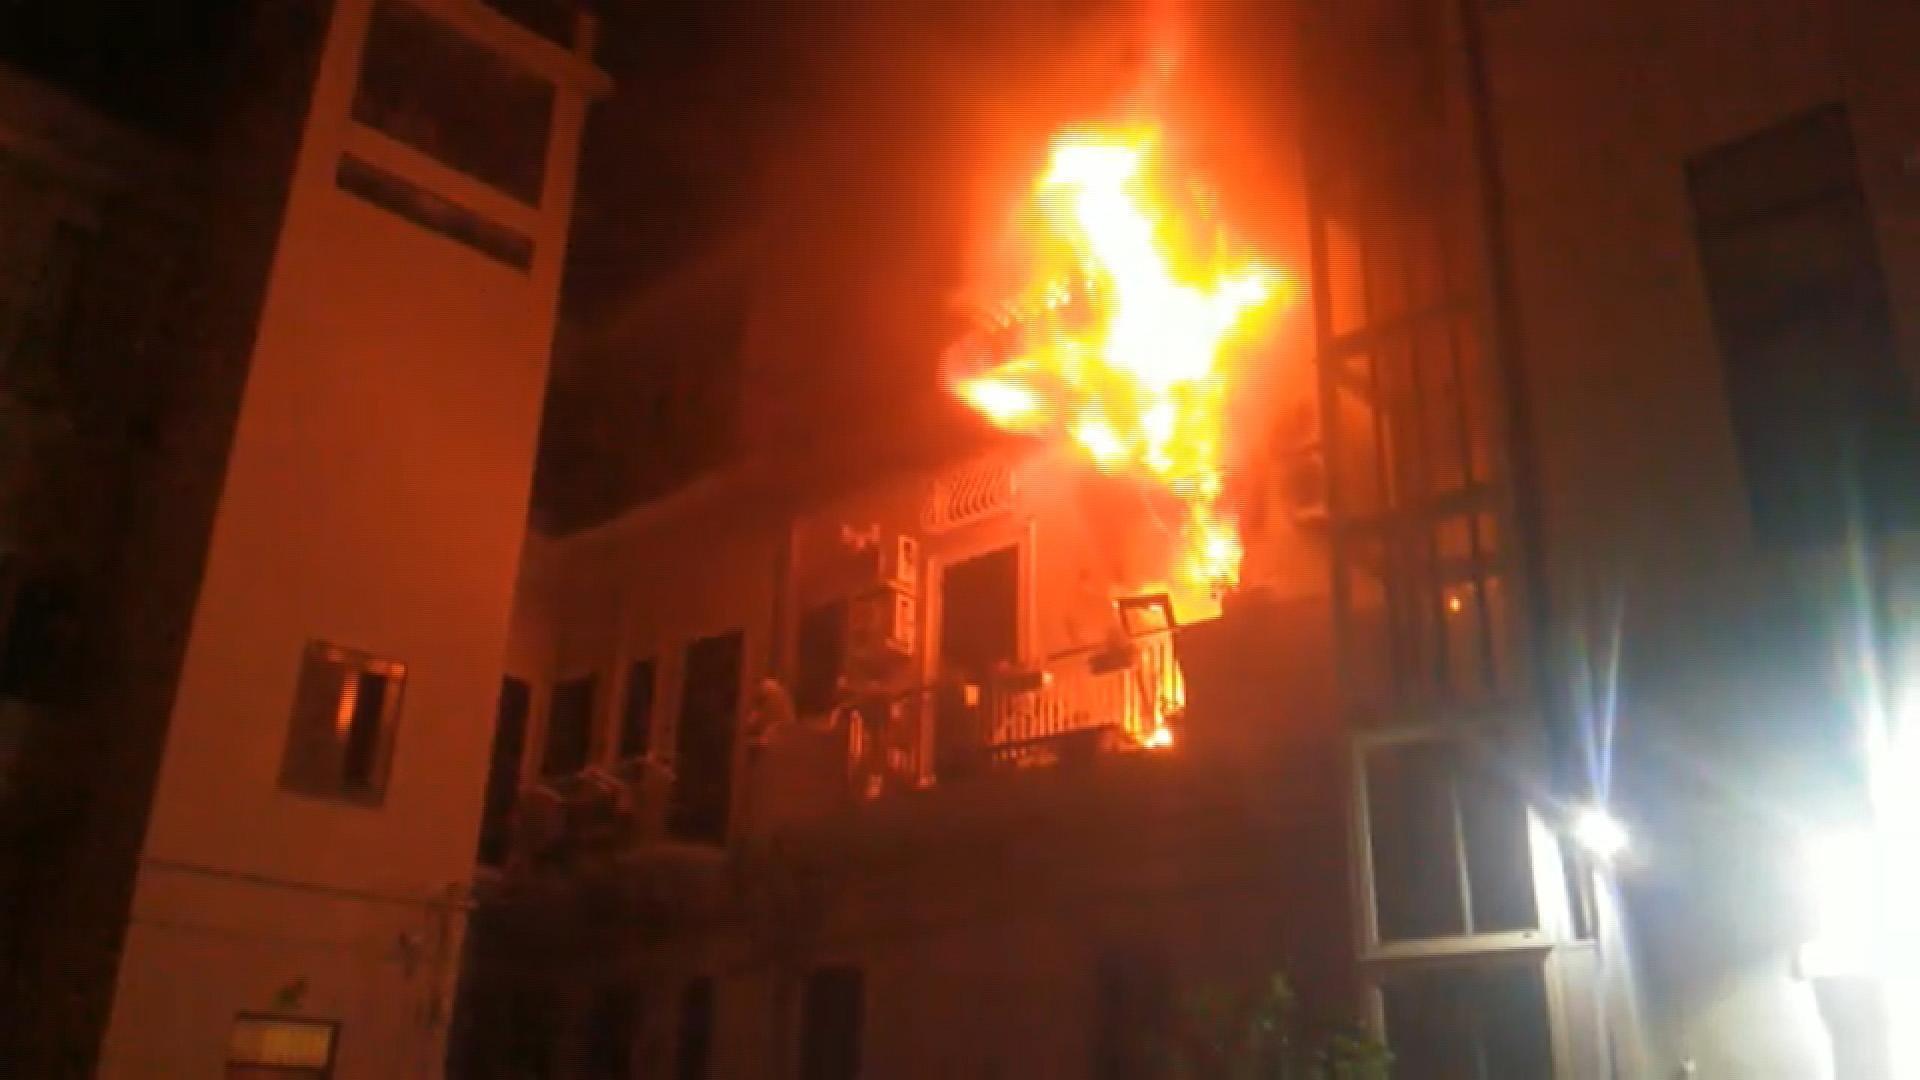 Incendio in casa, tragedia a Messina: morti due bimbi di 10 e 13 anni, salvati i genitori e altri due fratelli